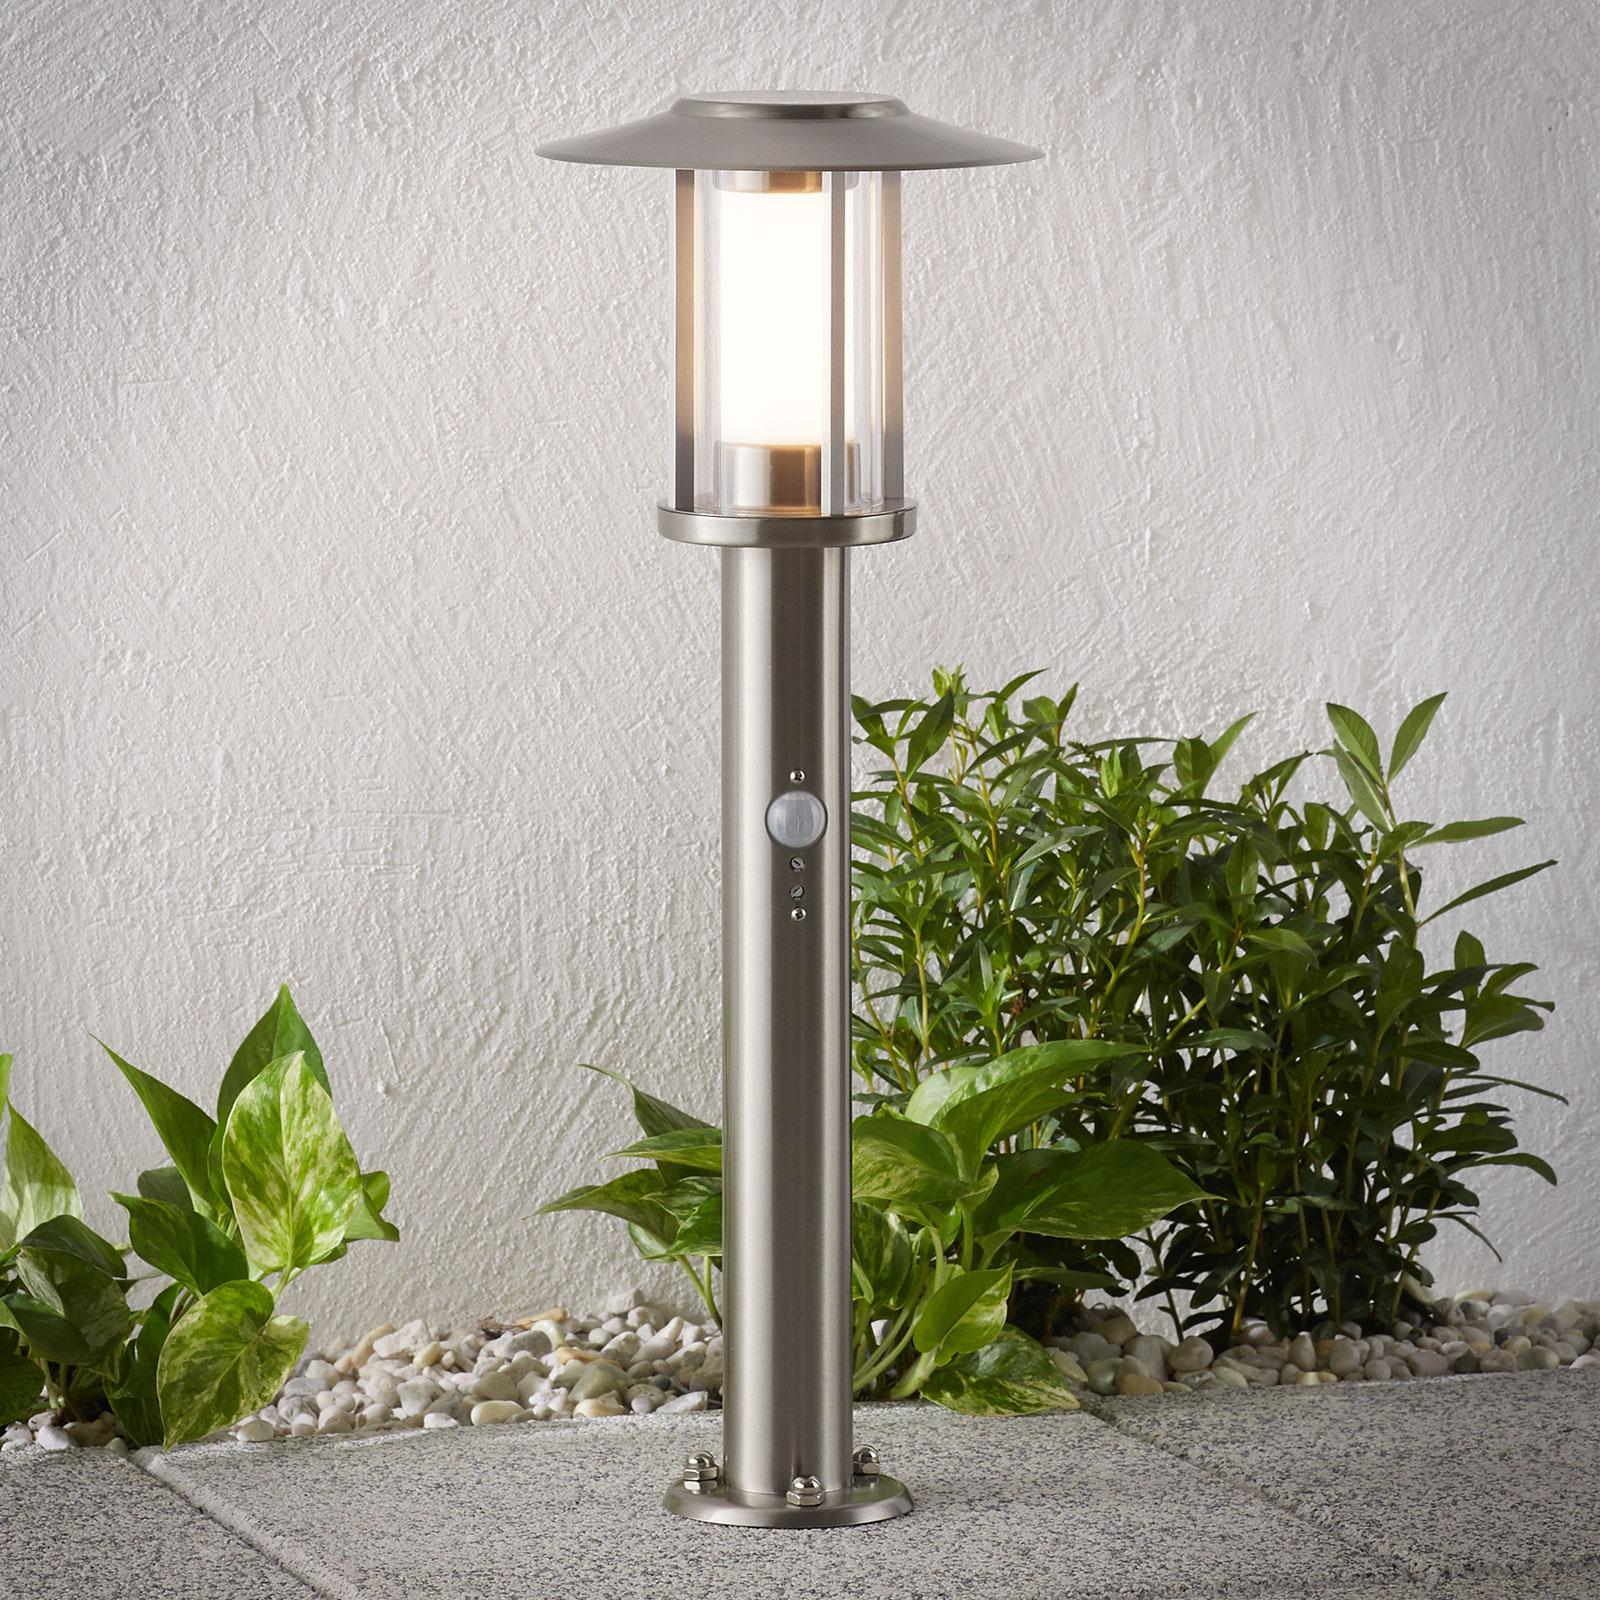 LED-Sockellampe Gregory, Edelstahl, mit Sensor